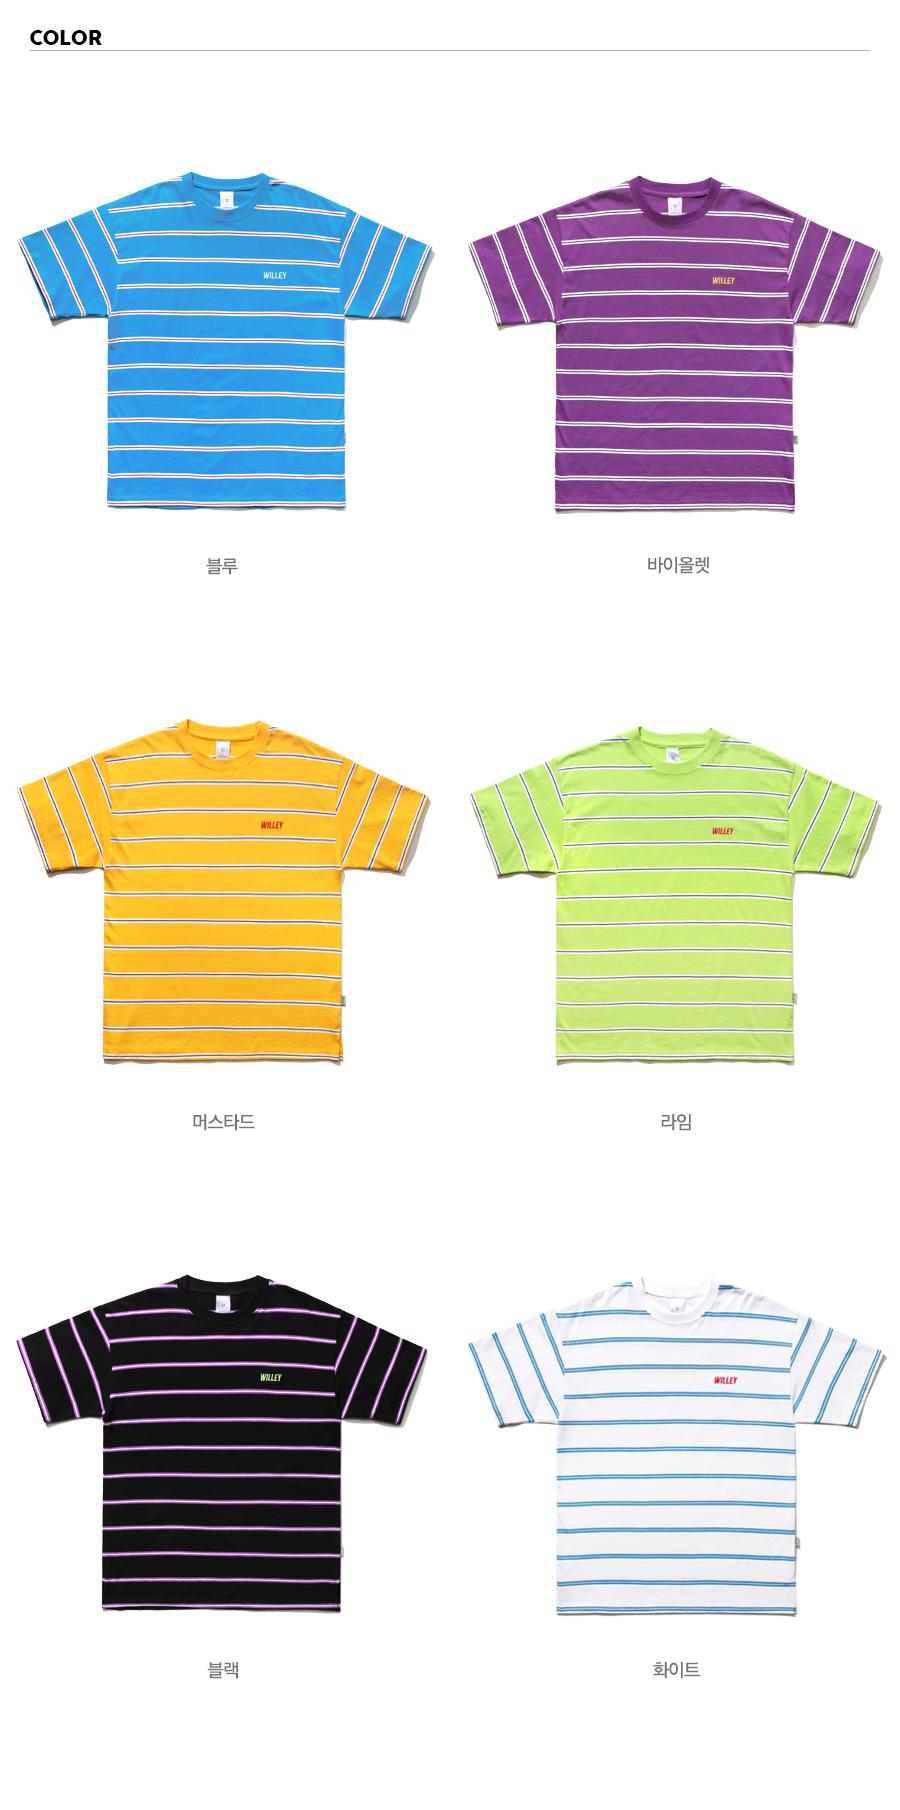 20180423_willey_stripe_t-shirts_color_kj.jpg